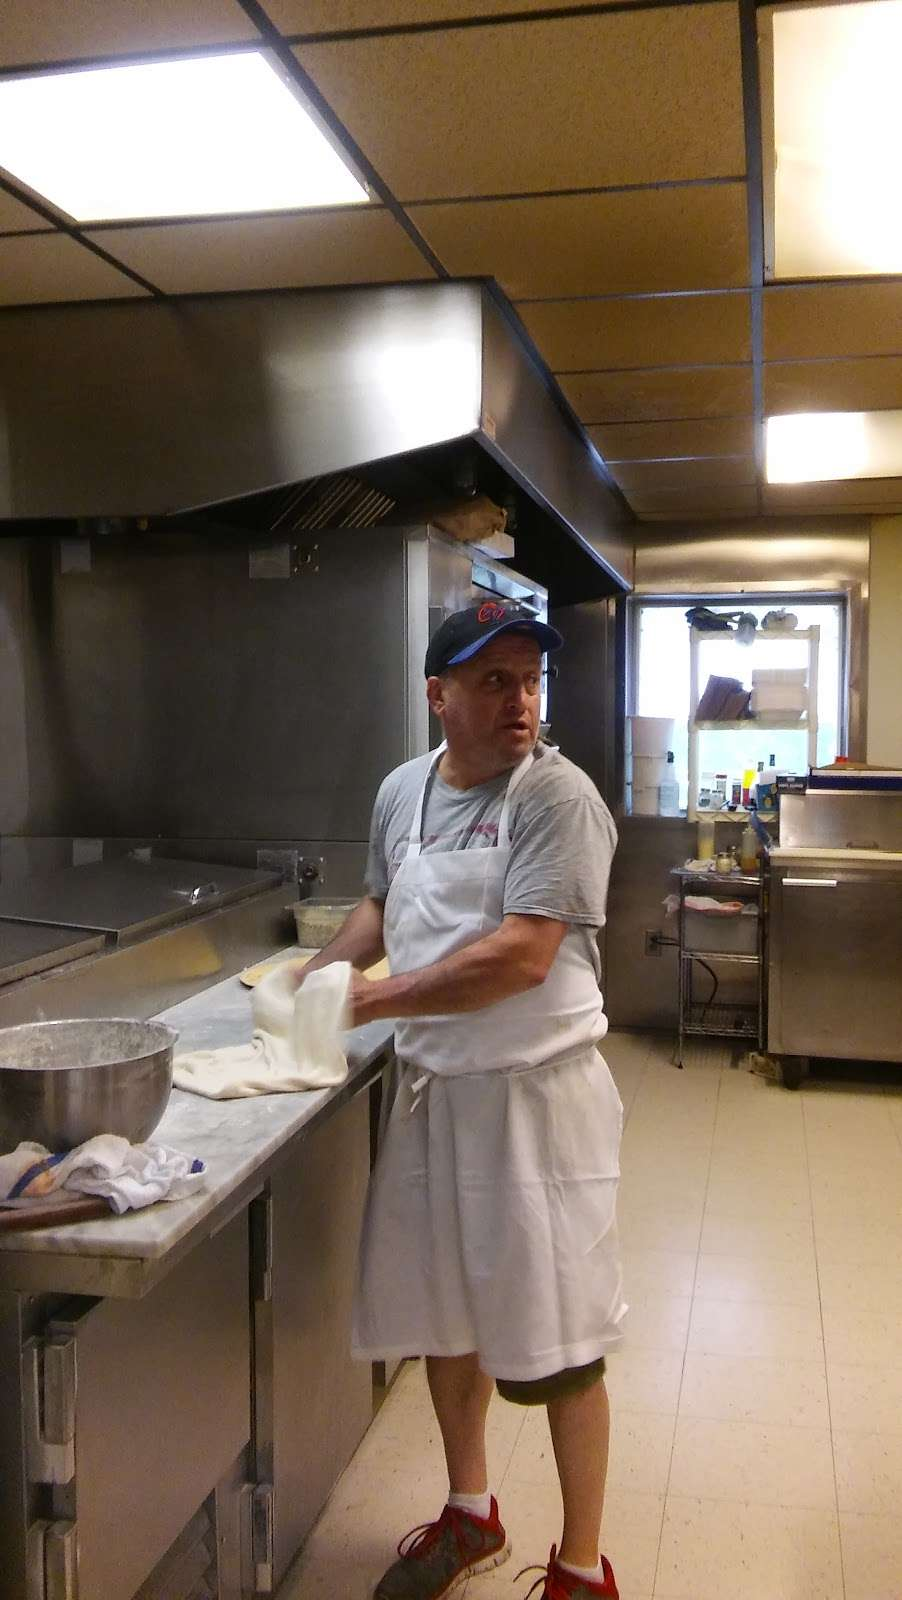 Coppolas Pizza & Restaurant - restaurant  | Photo 8 of 10 | Address: 2267 PA-447, Analomink, PA 18320, USA | Phone: (570) 420-4550